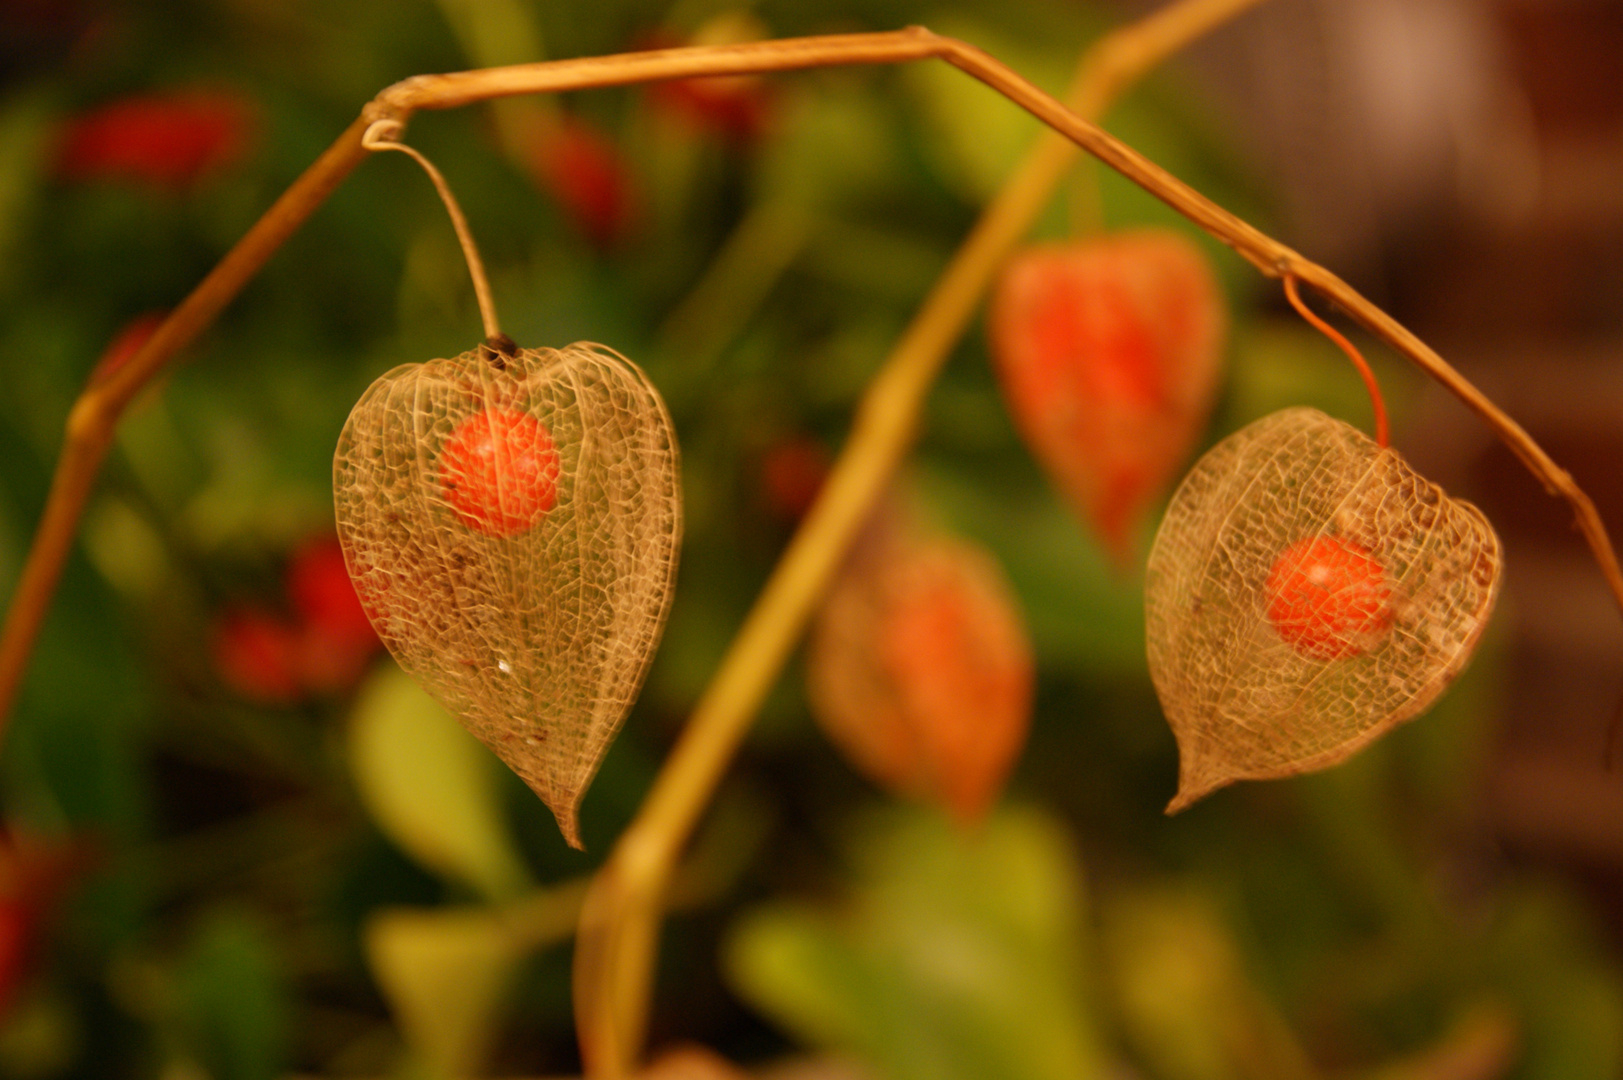 lampionblume physalis foto bild pflanzen pilze flechten fr chte und beeren natur. Black Bedroom Furniture Sets. Home Design Ideas